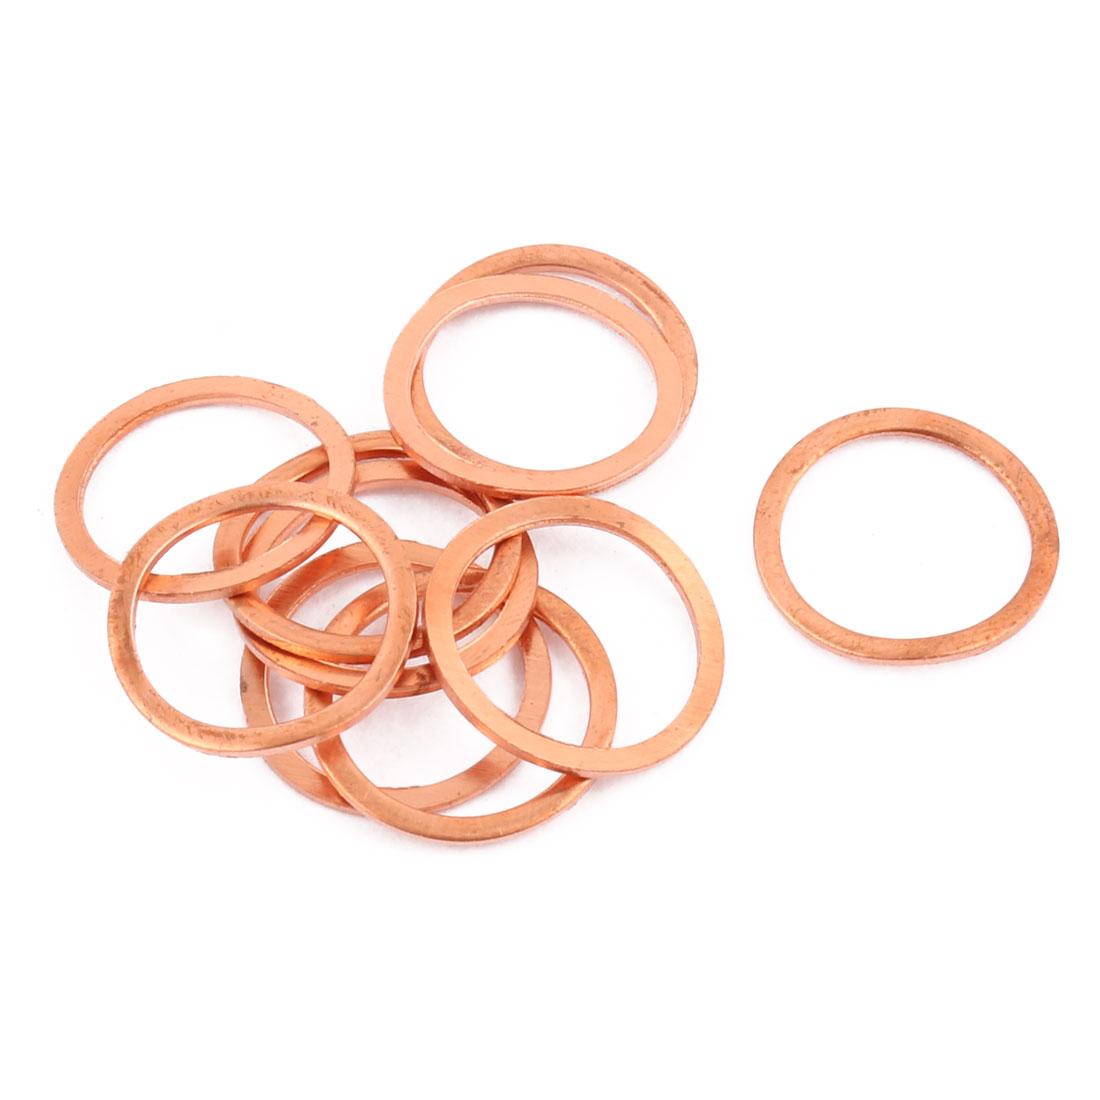 10pcs 20mm x 16mm x 1mm Flat Ring Copper Crush Washer Sealing Gasket Fastener